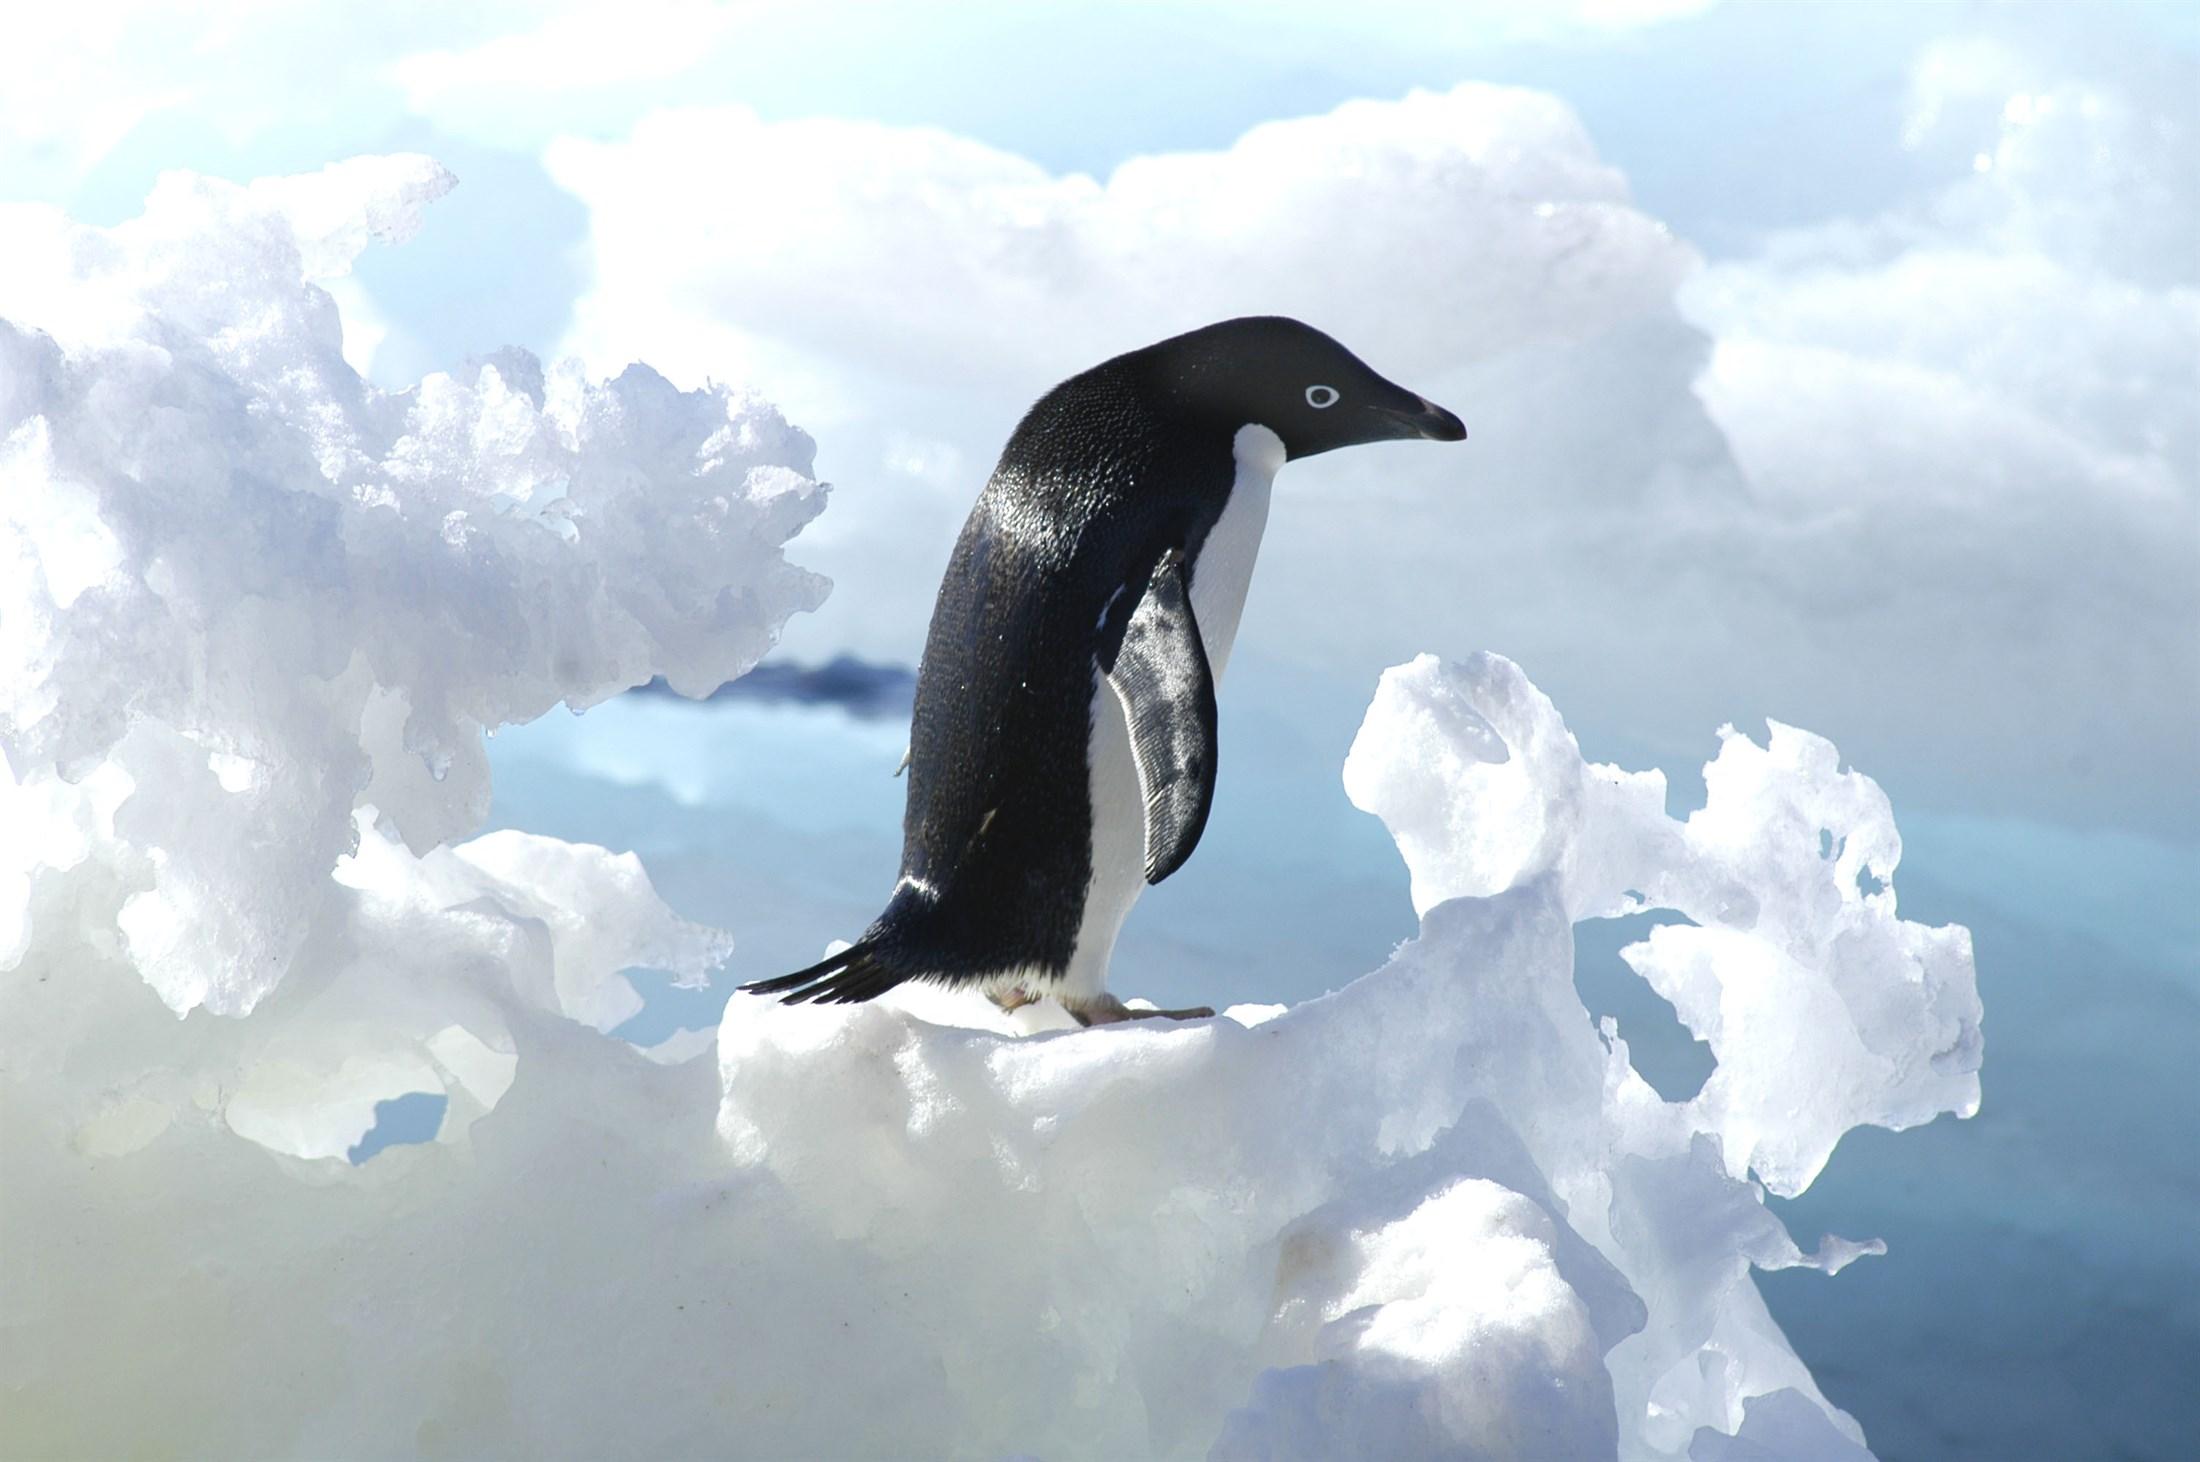 adelie-penguin-pygoscelis-adeliae-on-iceberg-antarctic-peninsula_4718-2200x1462px